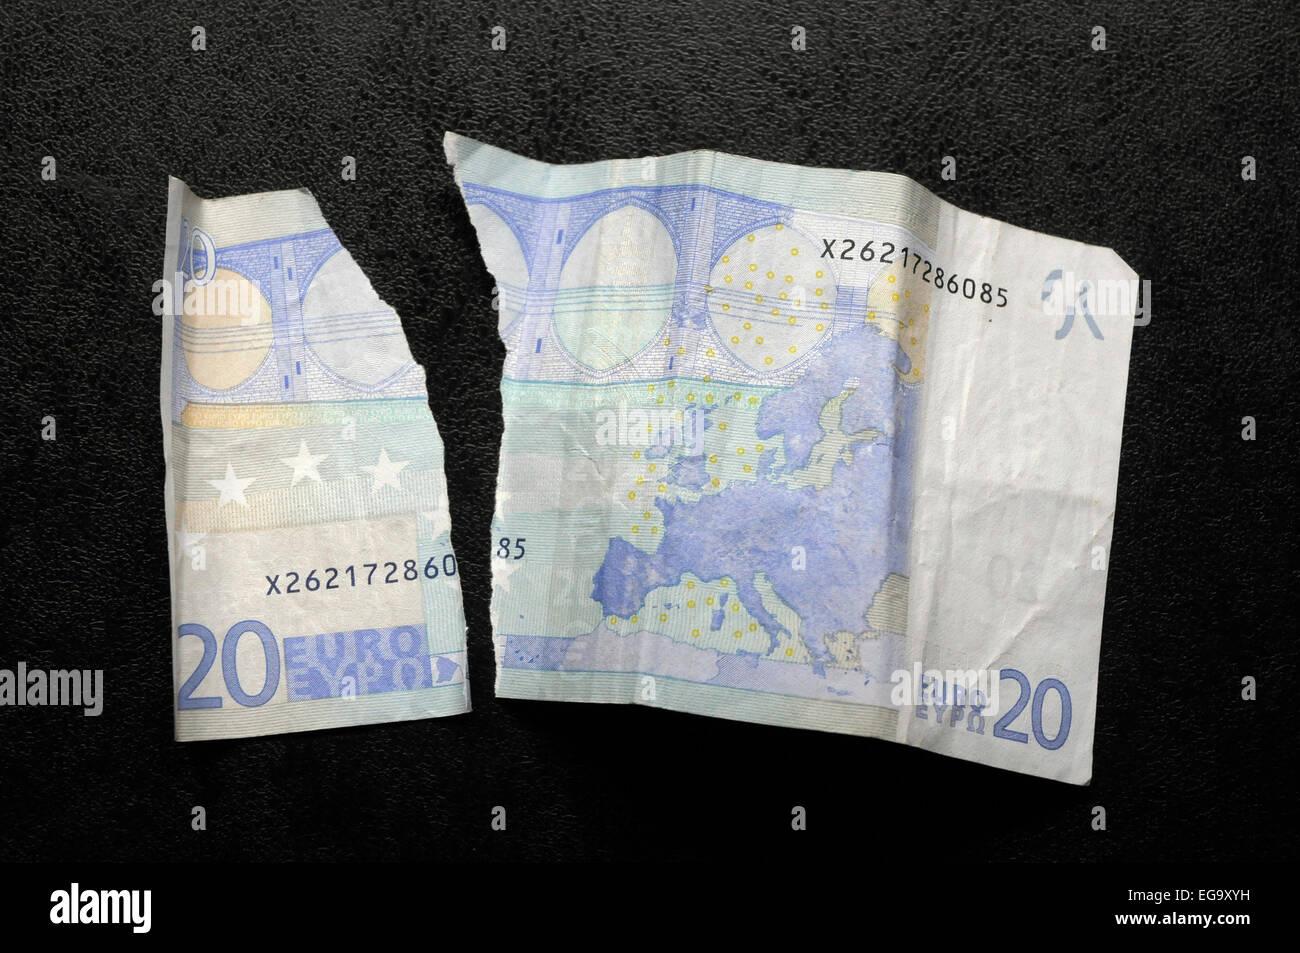 20 euros ripped € EEC MONEY - Stock Image